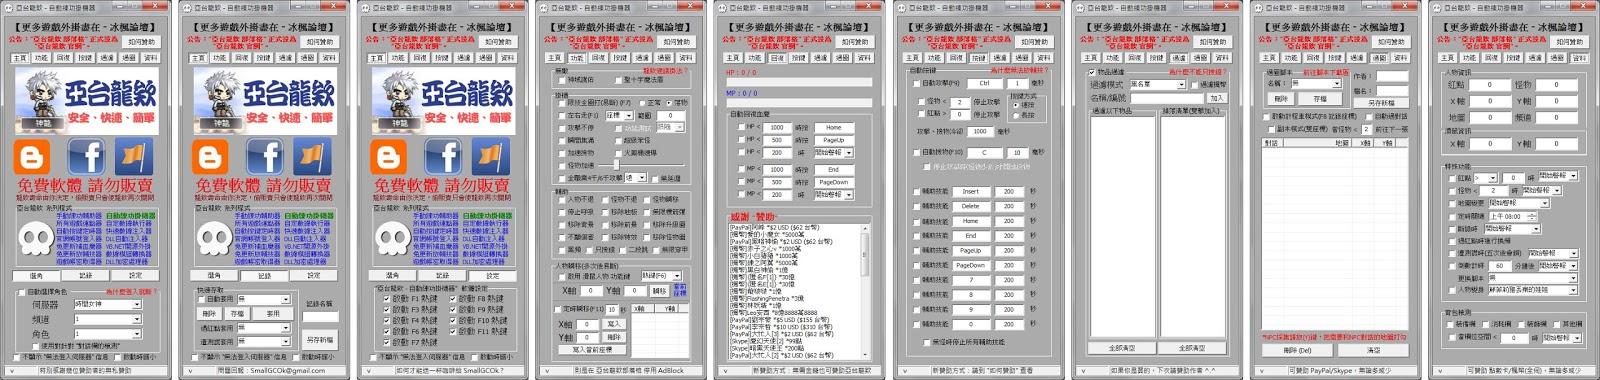 031445g6p7socqtp7w7xxo - 亞台龍欸 - 自動練功掛機器 v191.1.2 免費的新楓之谷外掛